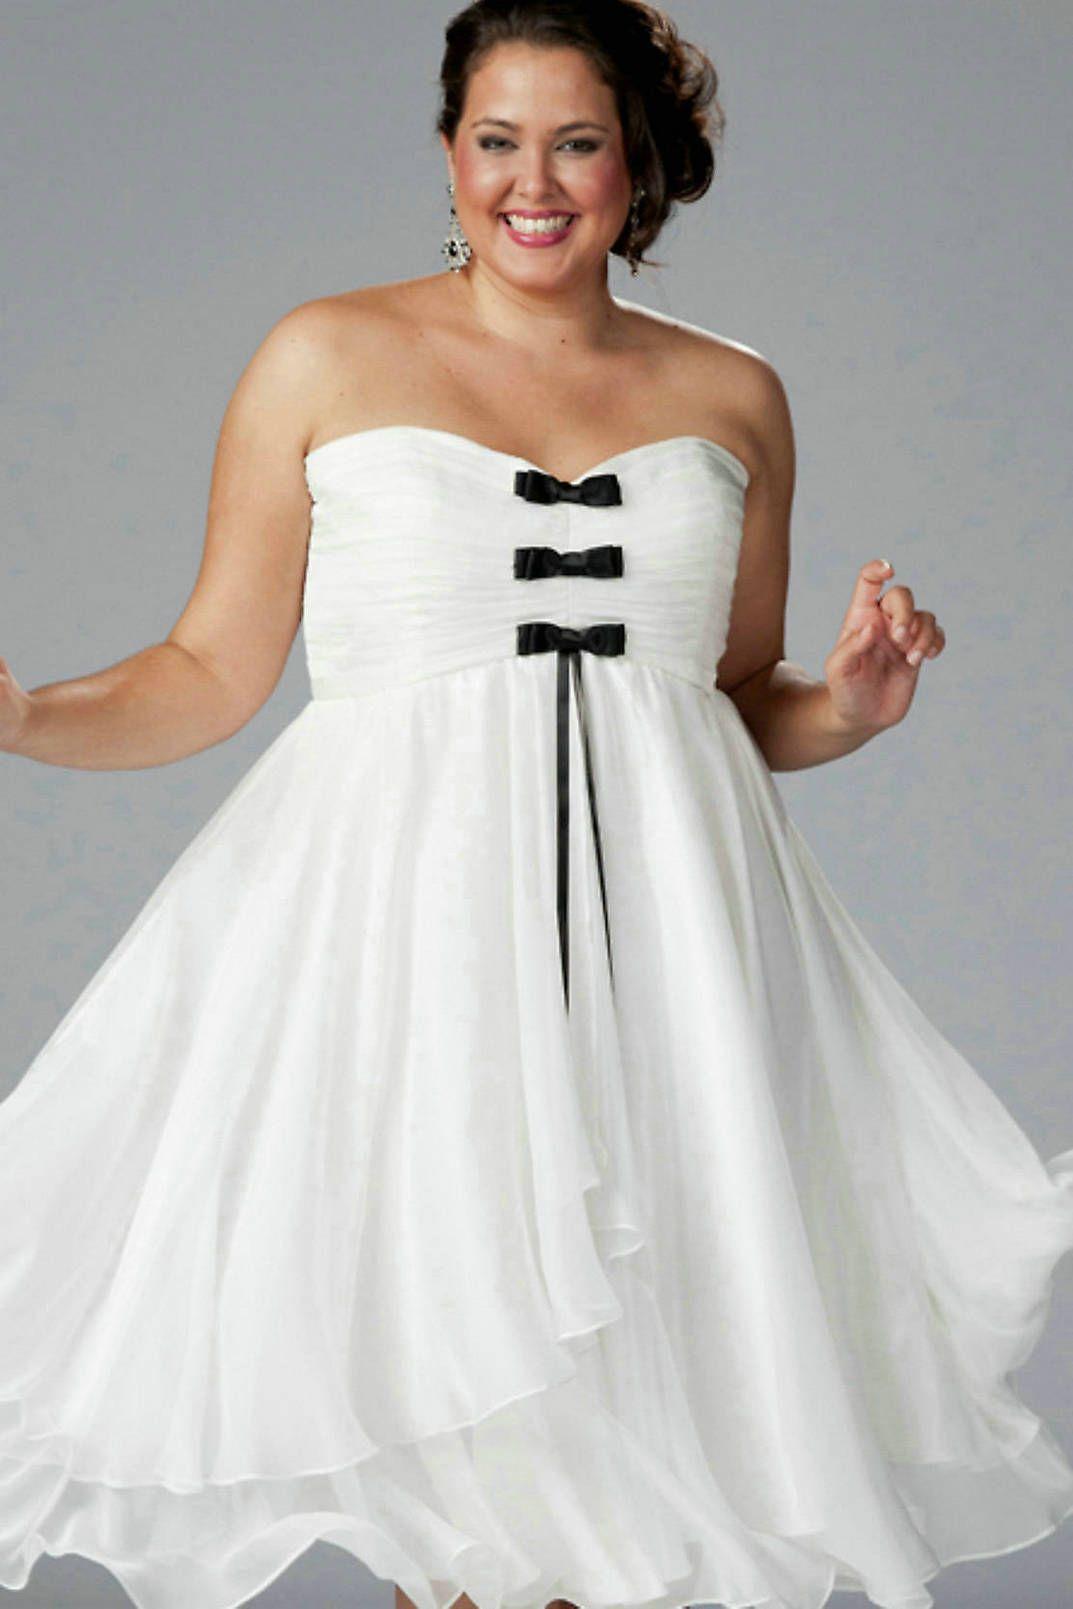 Plus Size Bridesmaid Dresses Color Attire Bridesmaid Dresses Plus Size Casual Wedding Dress Wedding Dresses Plus Size